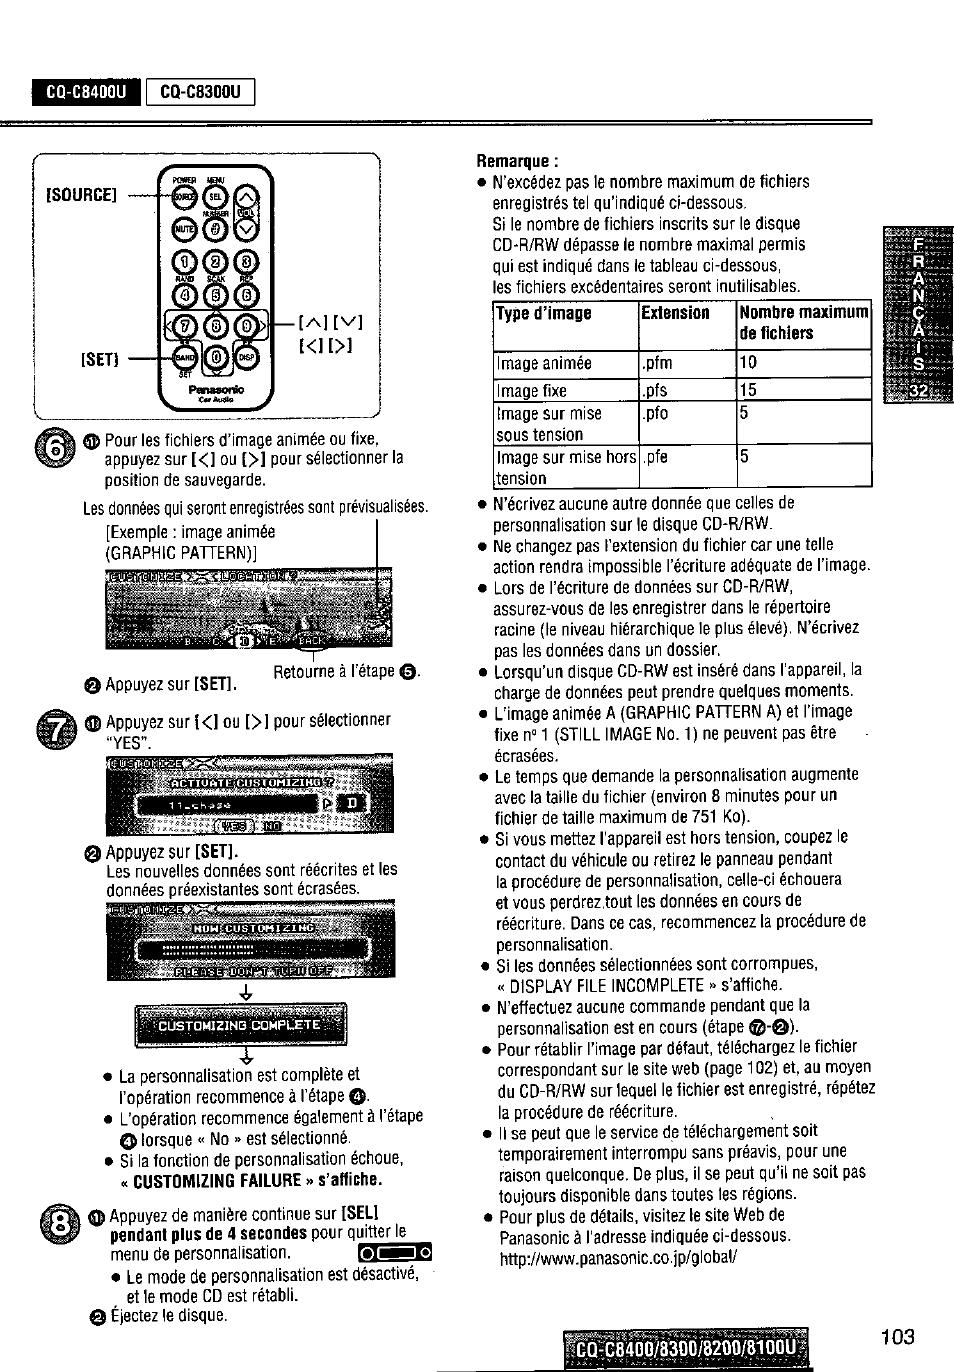 medium resolution of cq c8400u remarque p1 e panasonic cq c8300u user manual